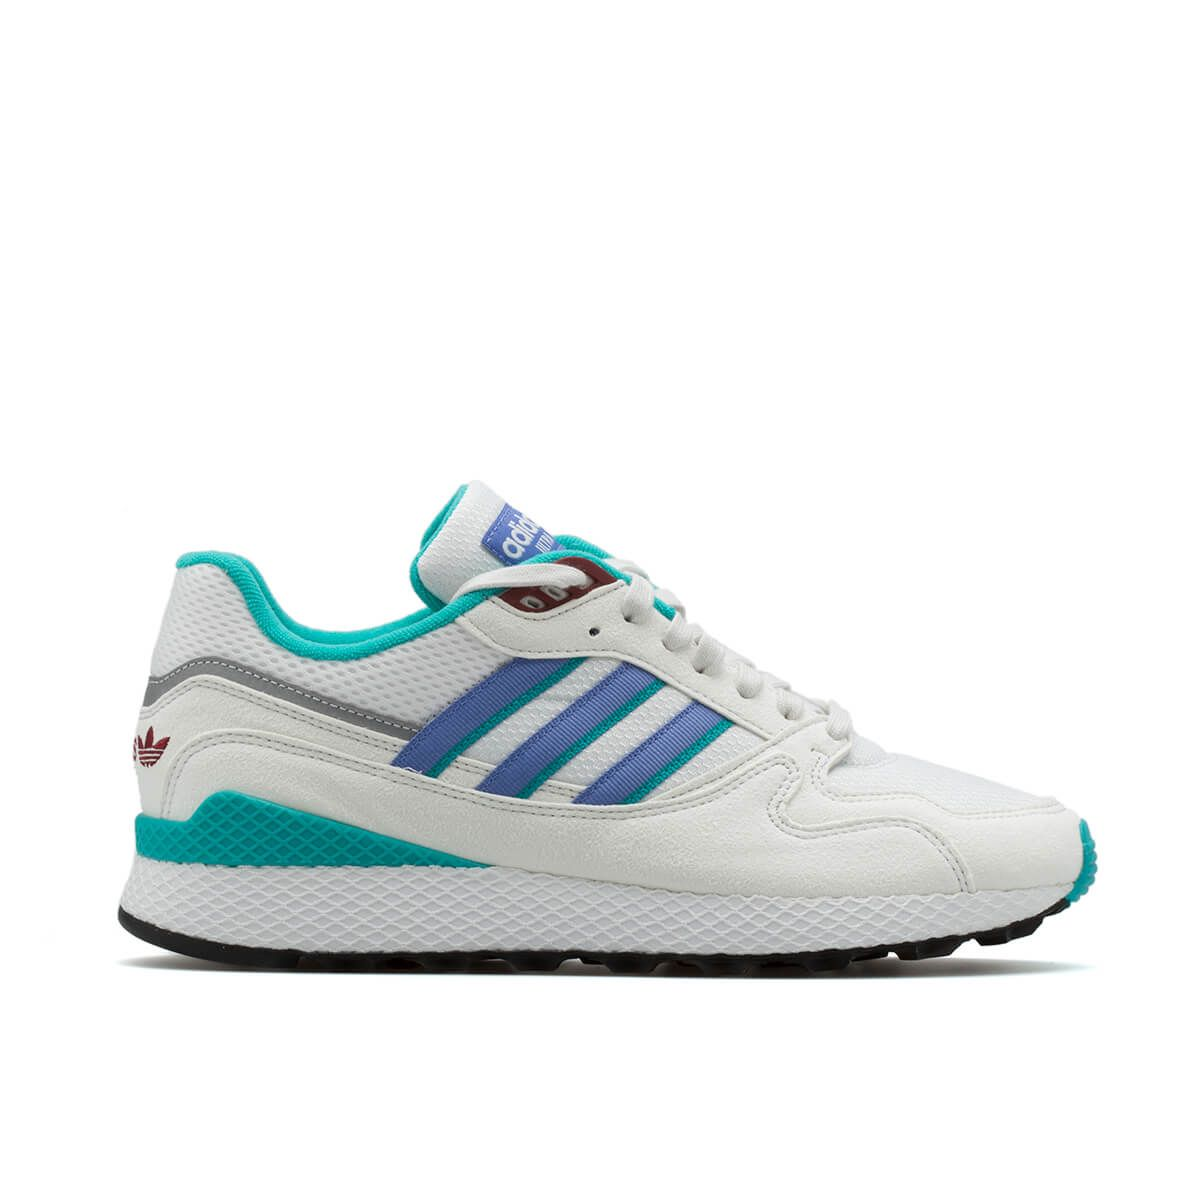 Adidas Ultra Tech Sneakers - White